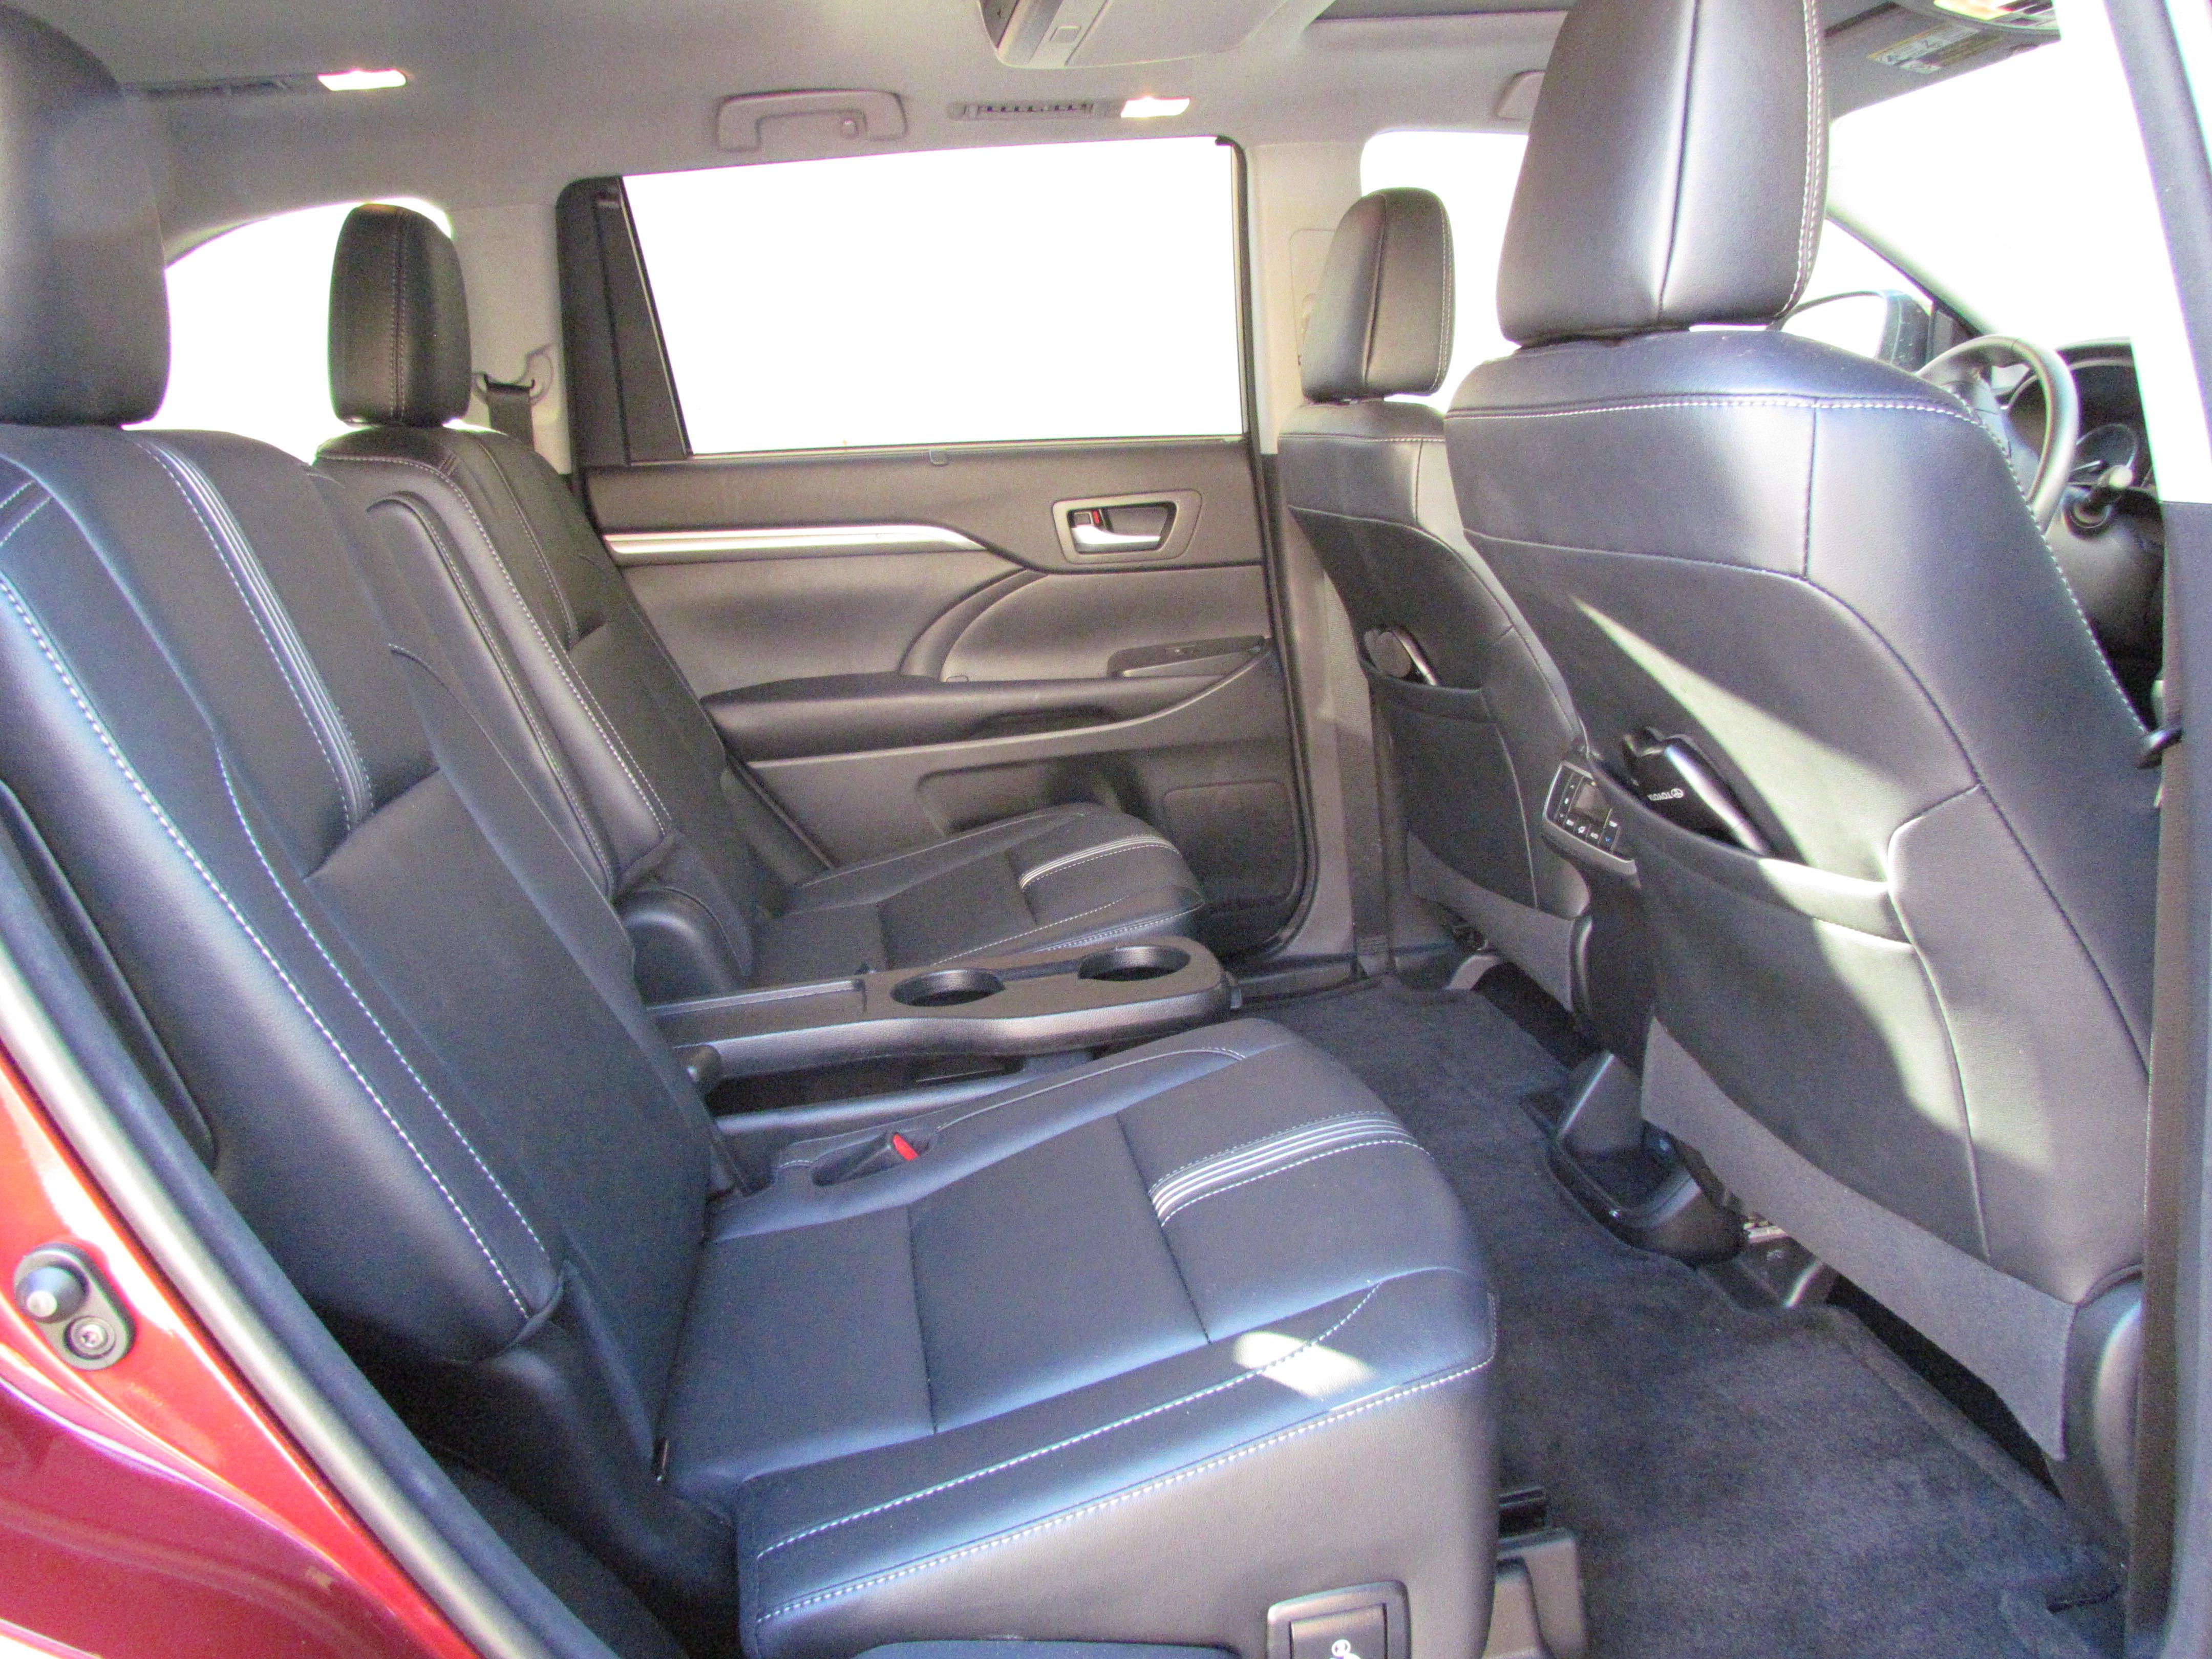 Driven 2017 Toyota Highlander Se Classiccars Com Journal